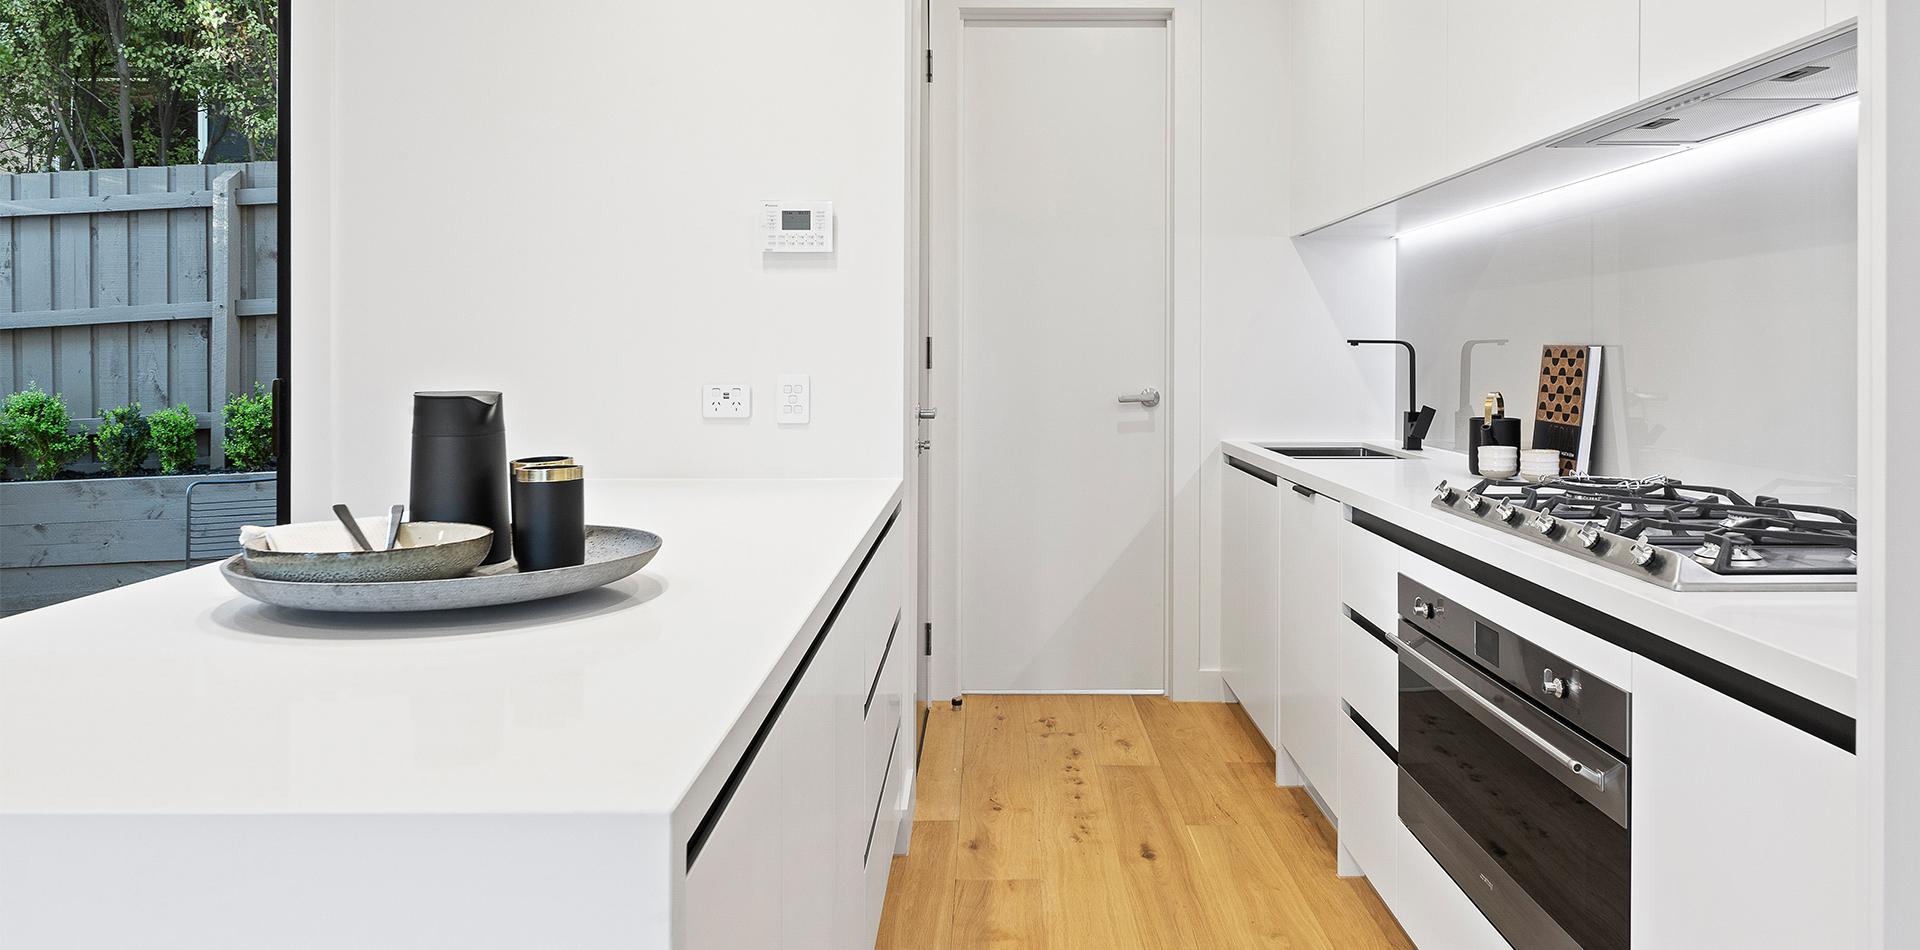 harry st - kitchen